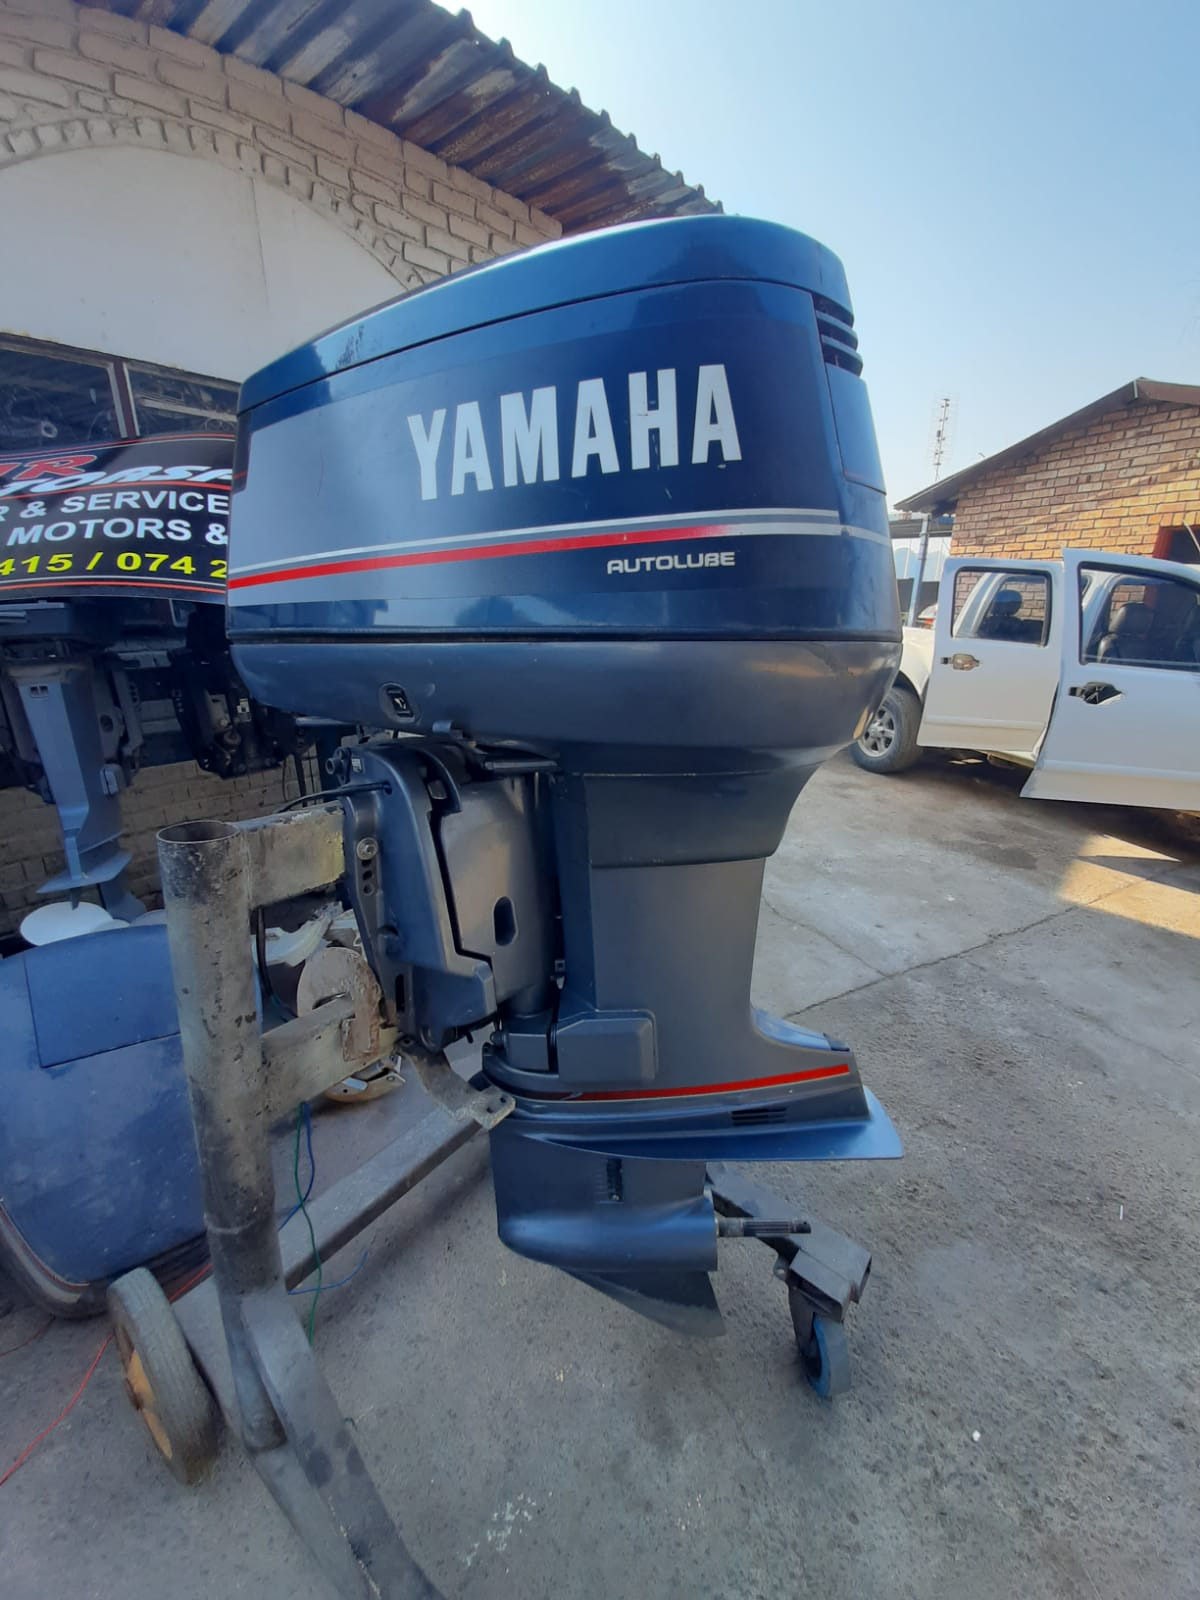 Yamaha 115 premix